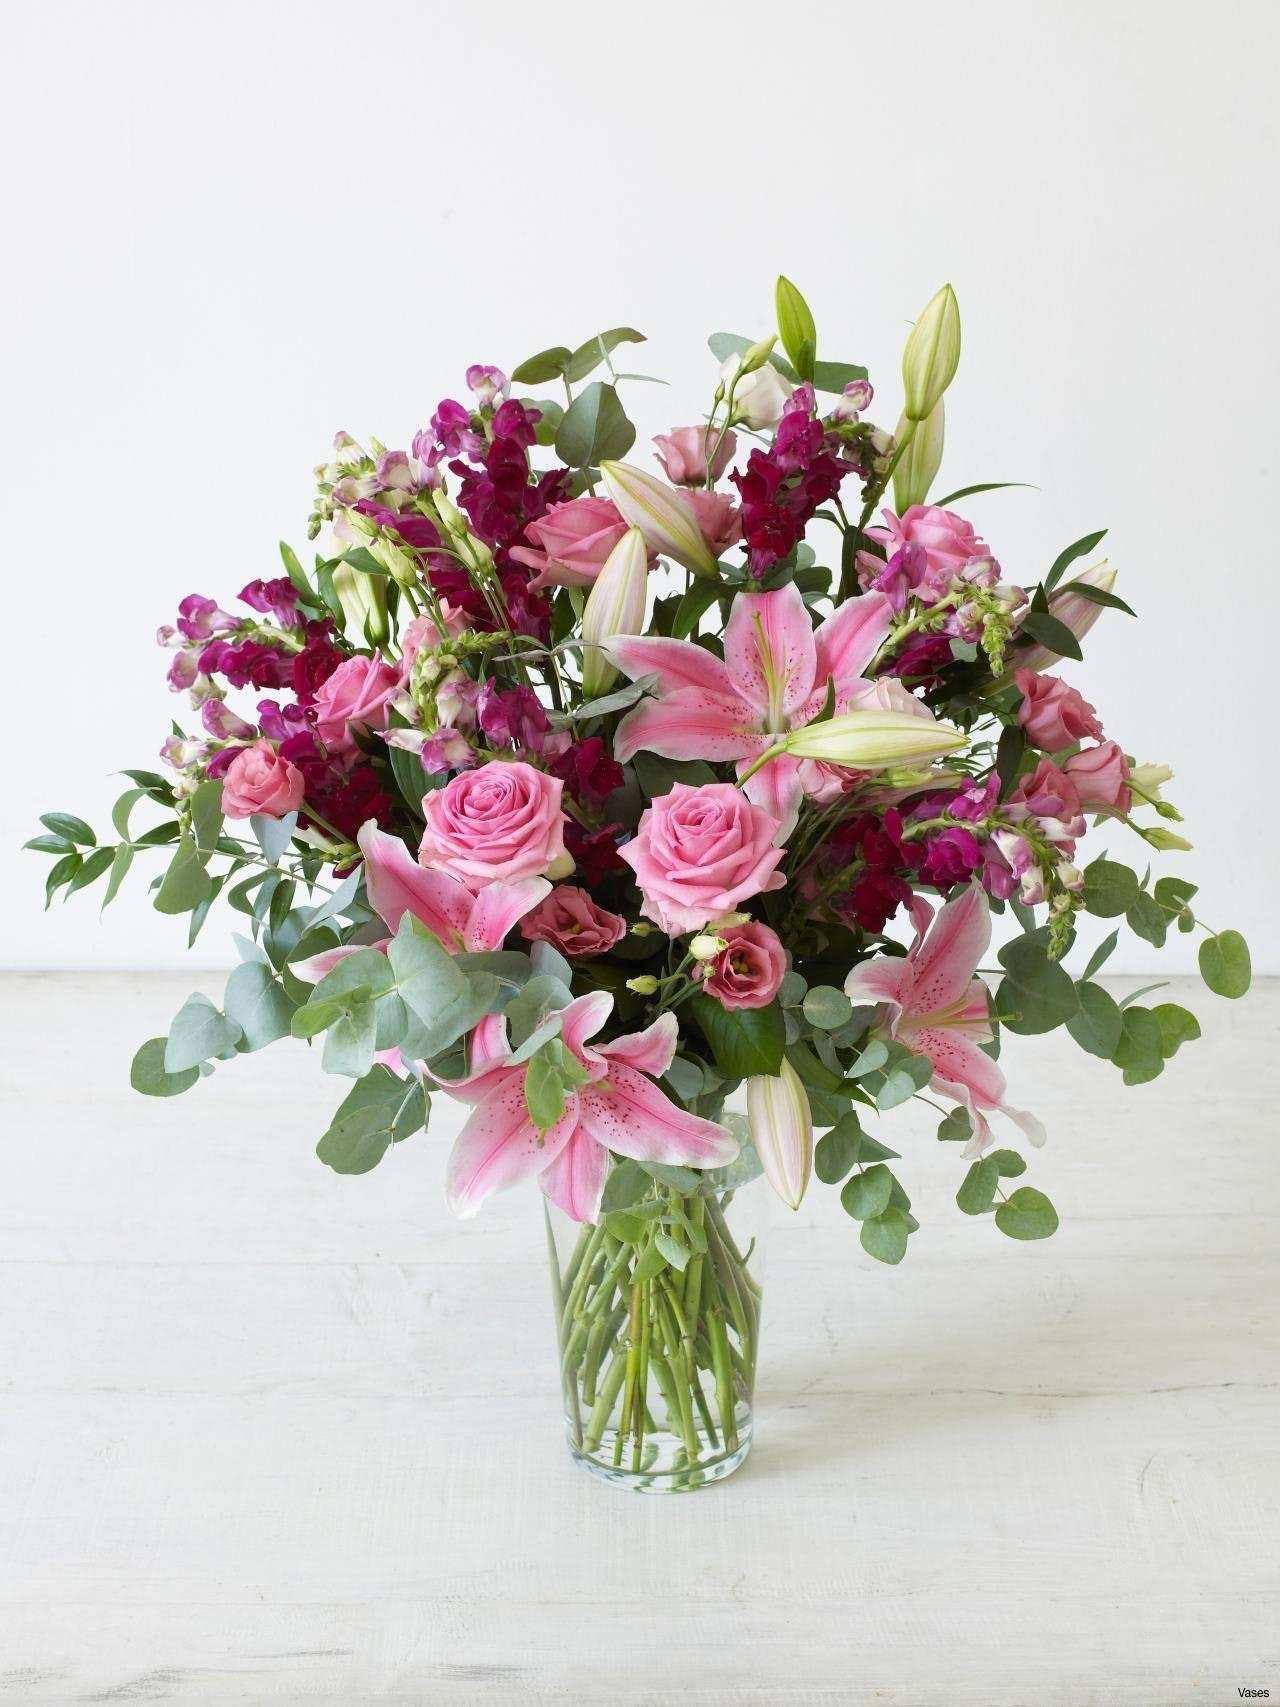 hydrangea in square vase of luxury flower ideas garden ideas pertaining to flower arrangements elegant floral arrangements 0d design ideas inspiration flower table arrangements ideas